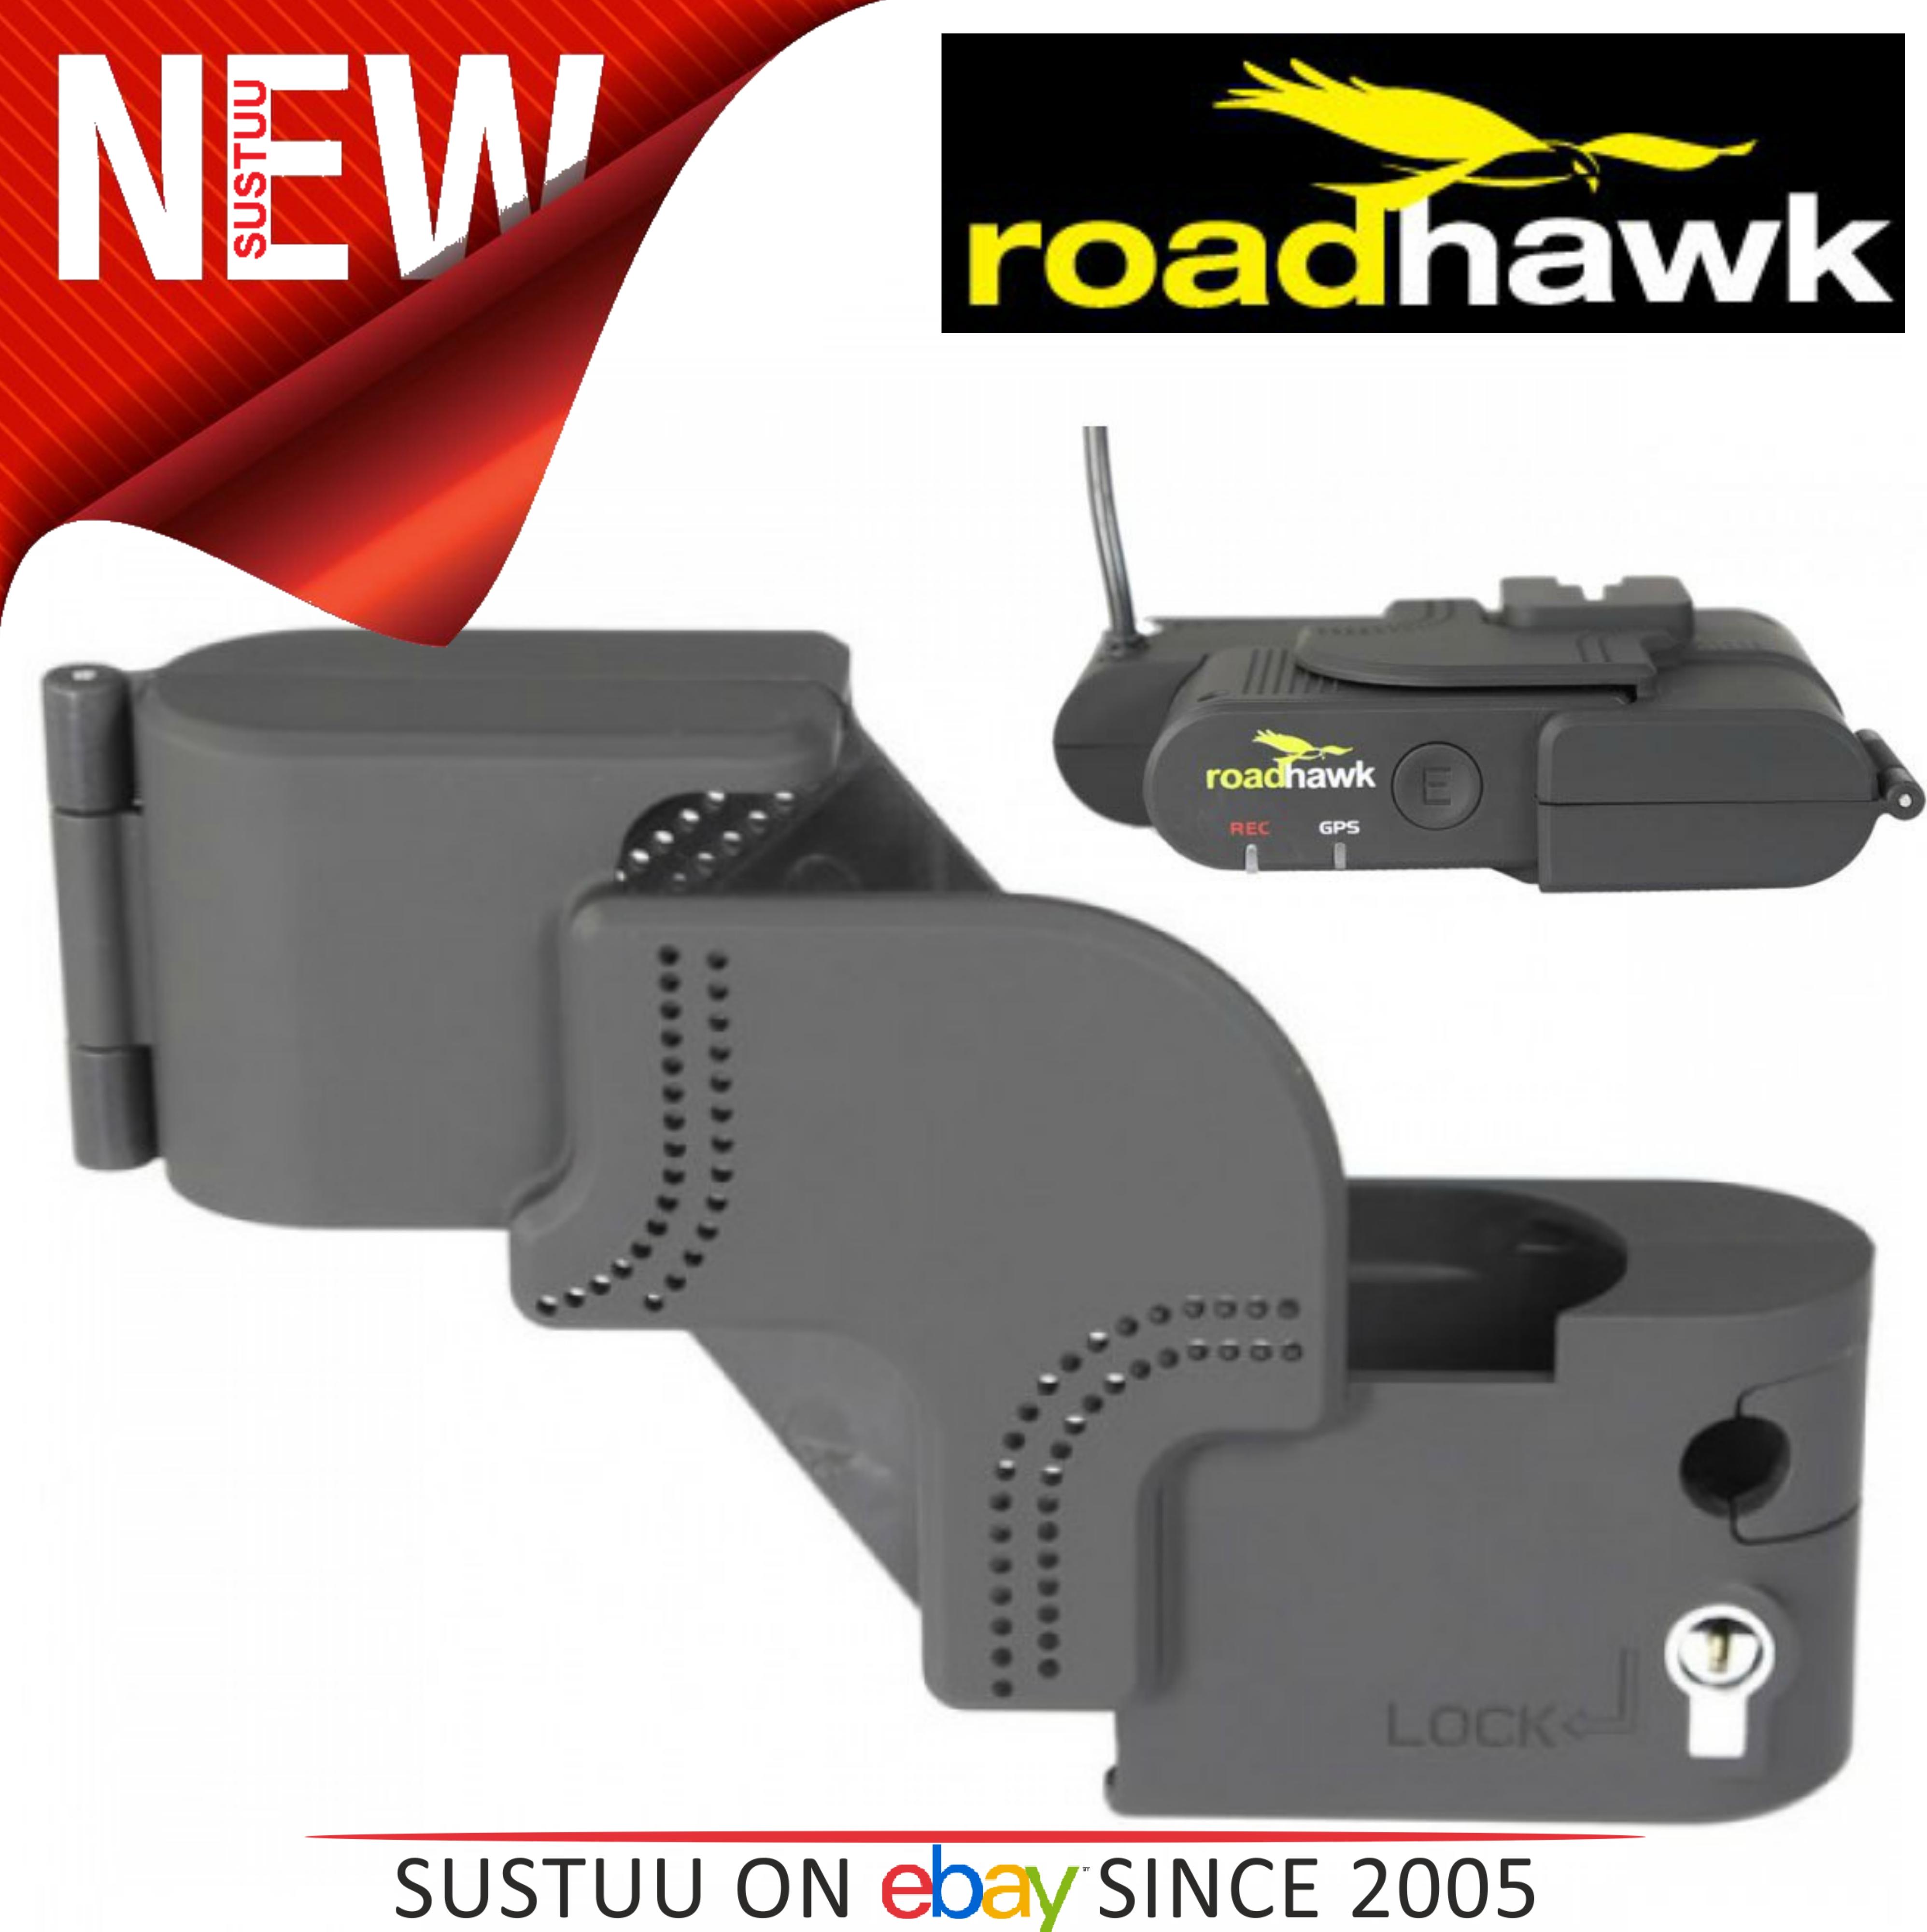 Roadhawk Locking Box For SD Card Power Cable Fit HD HD-2 CD-2 Dash Camera R20011